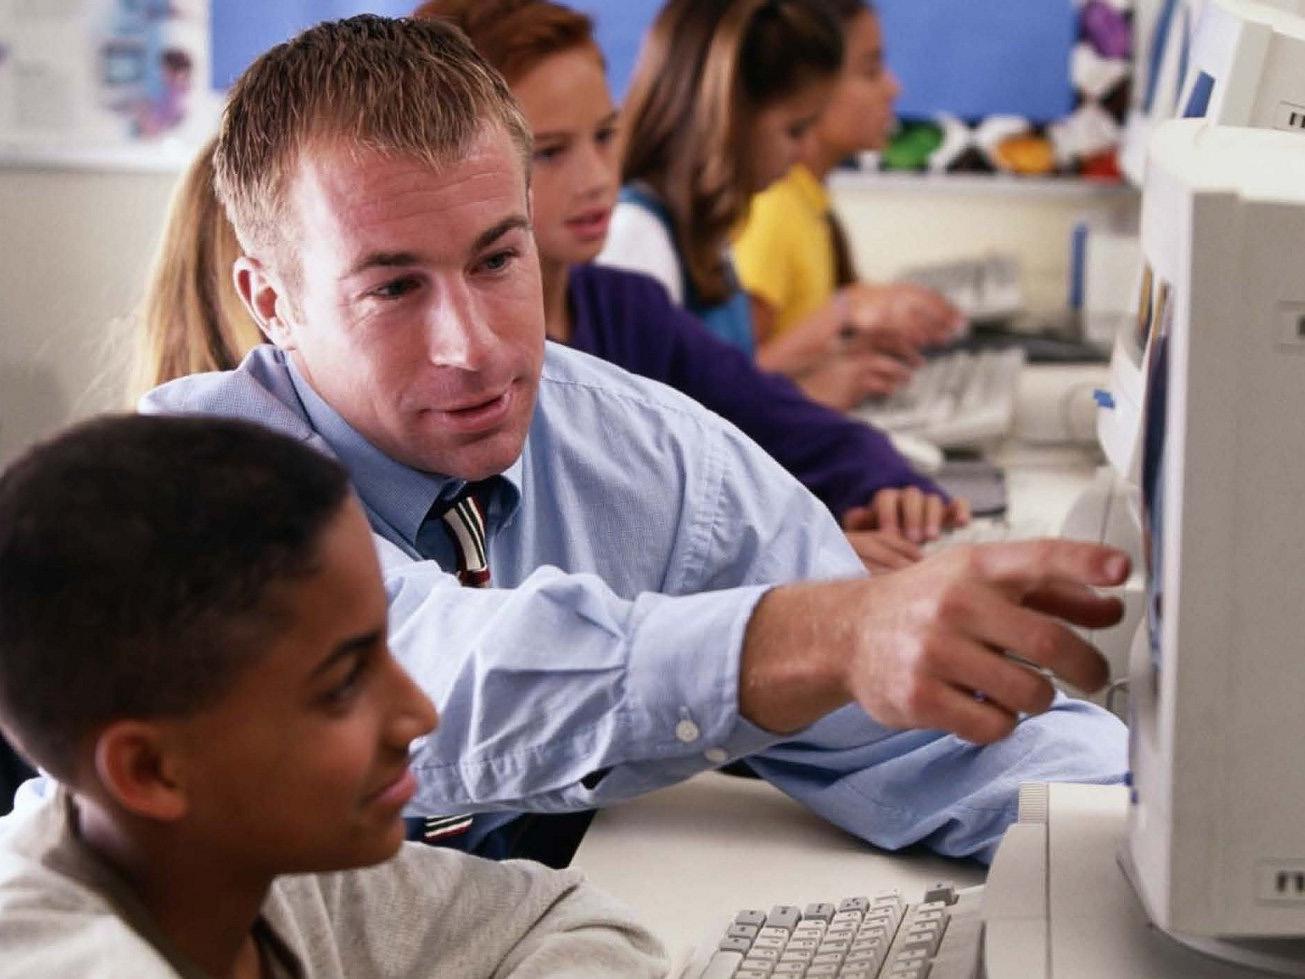 parents vs teachers as educators essays Parents vs teachers as educators essays about love, elements of research proposal writing, creative writing workshop france.